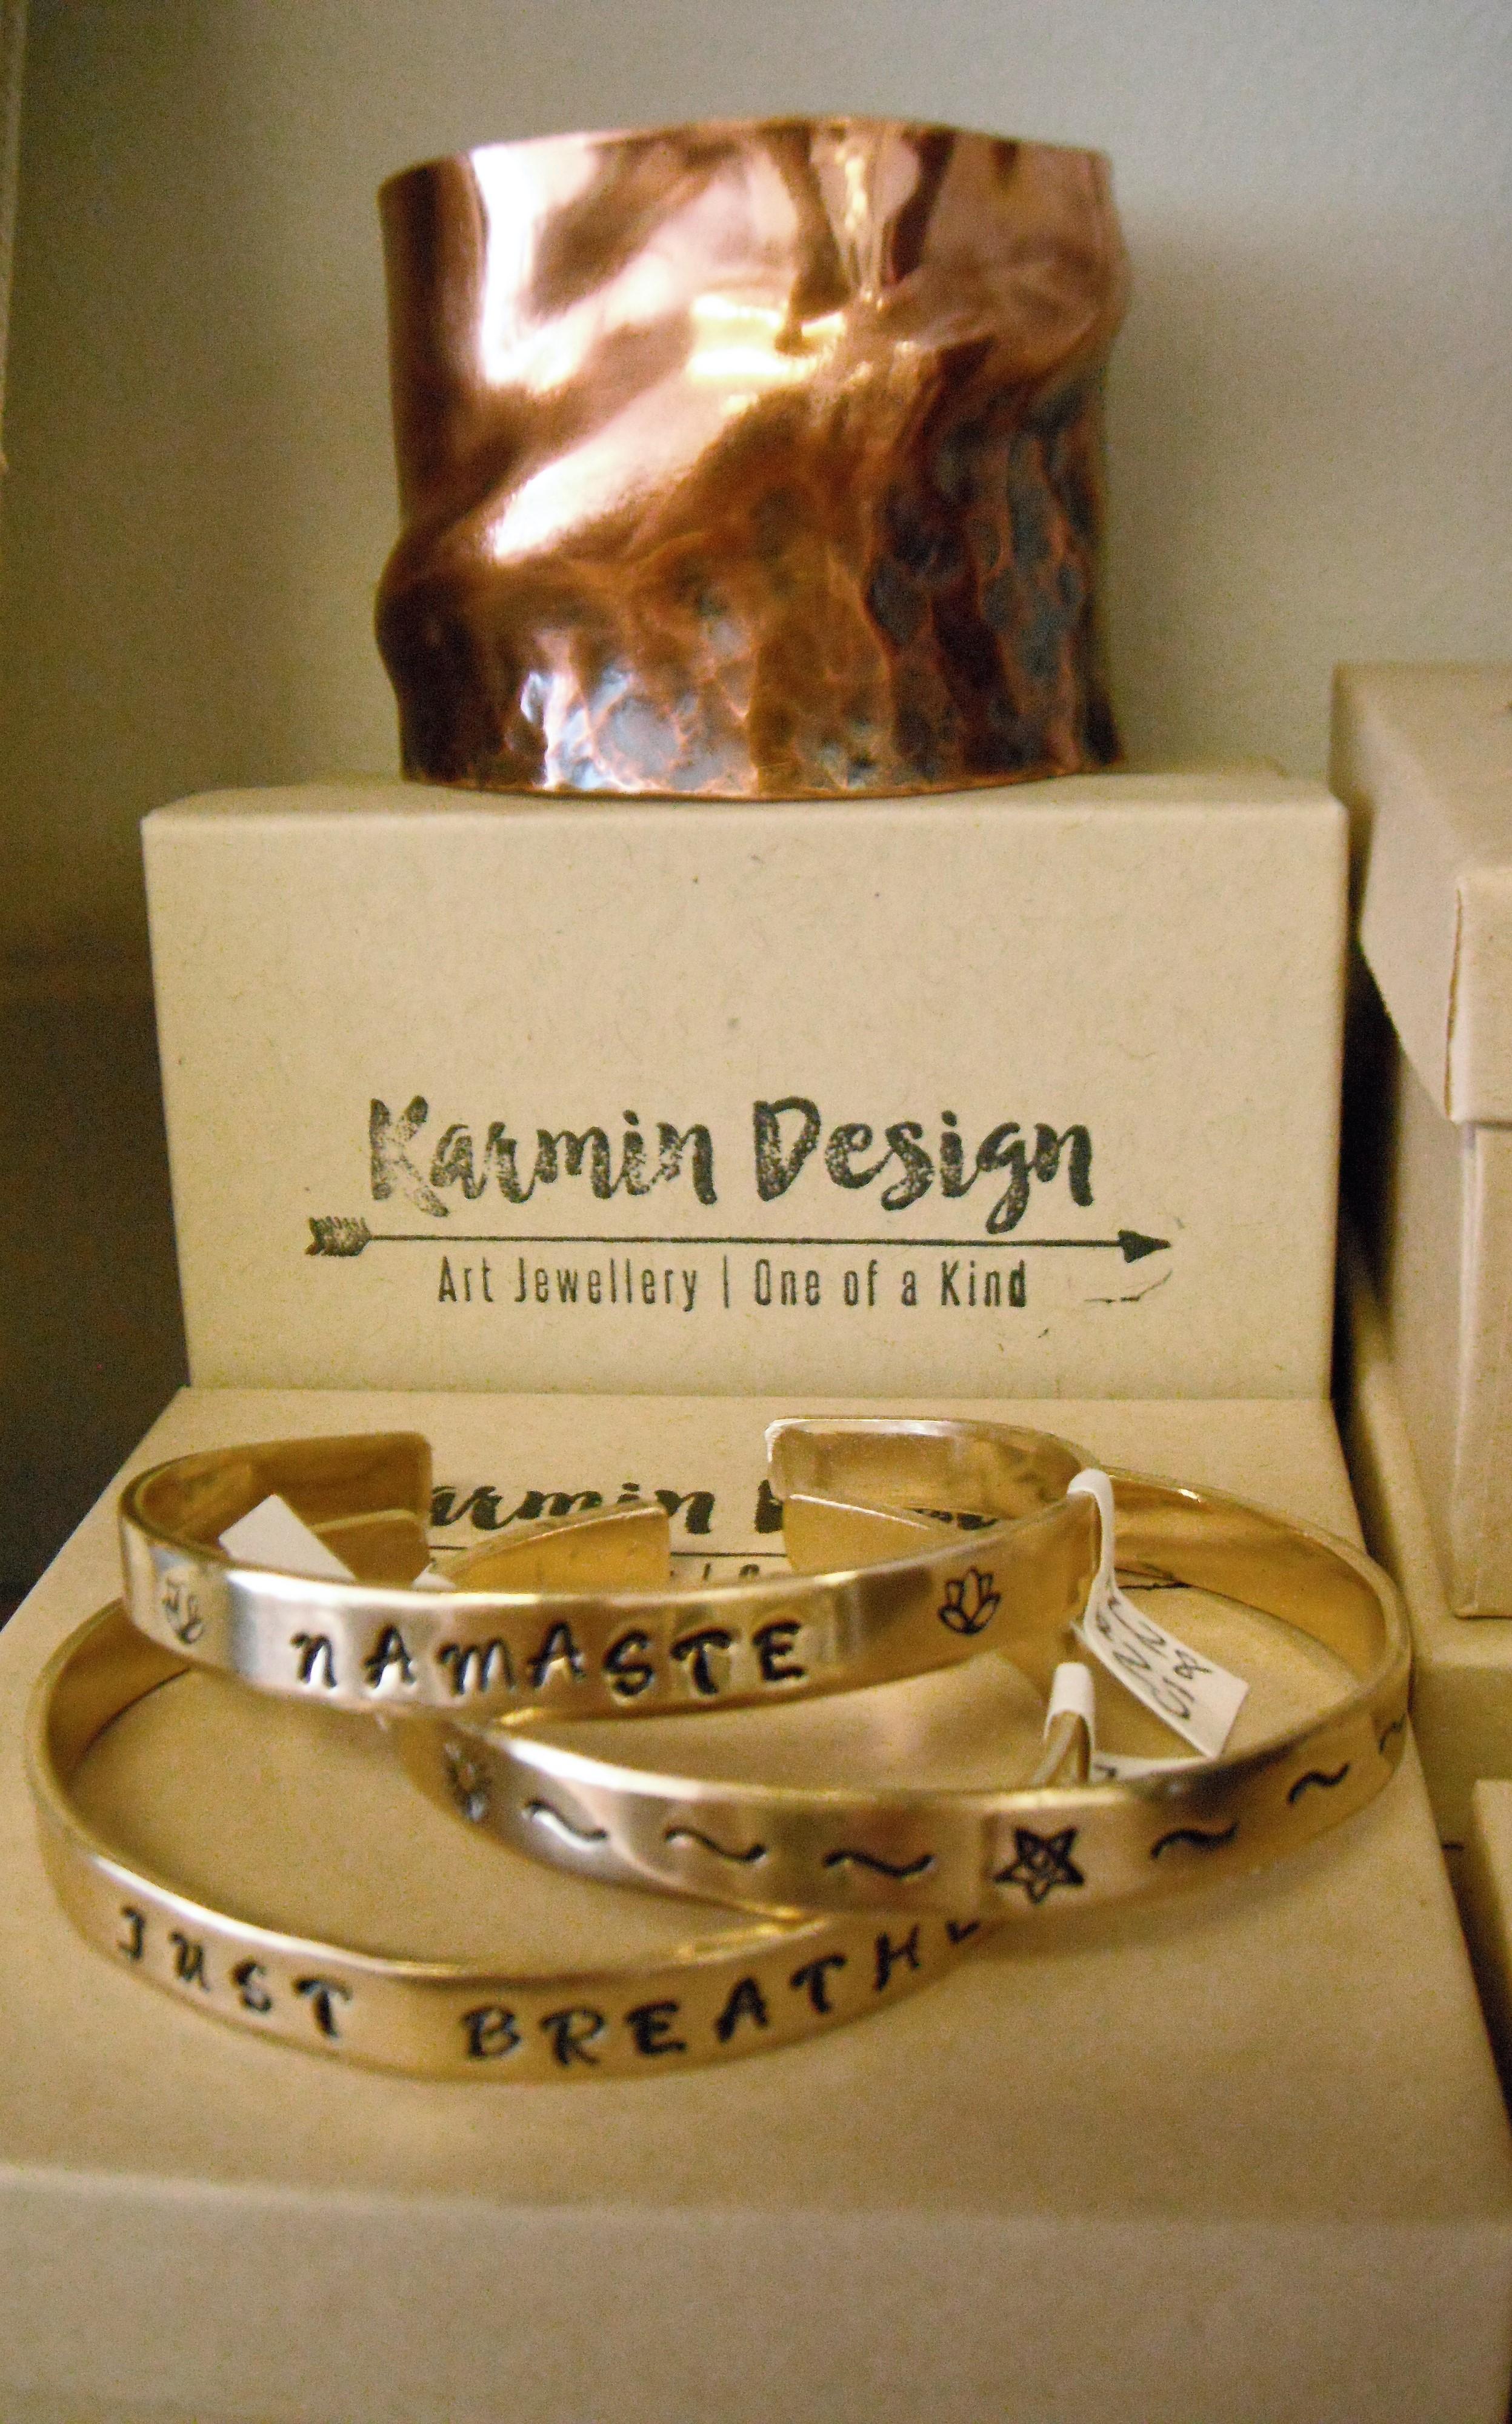 Karmin Design